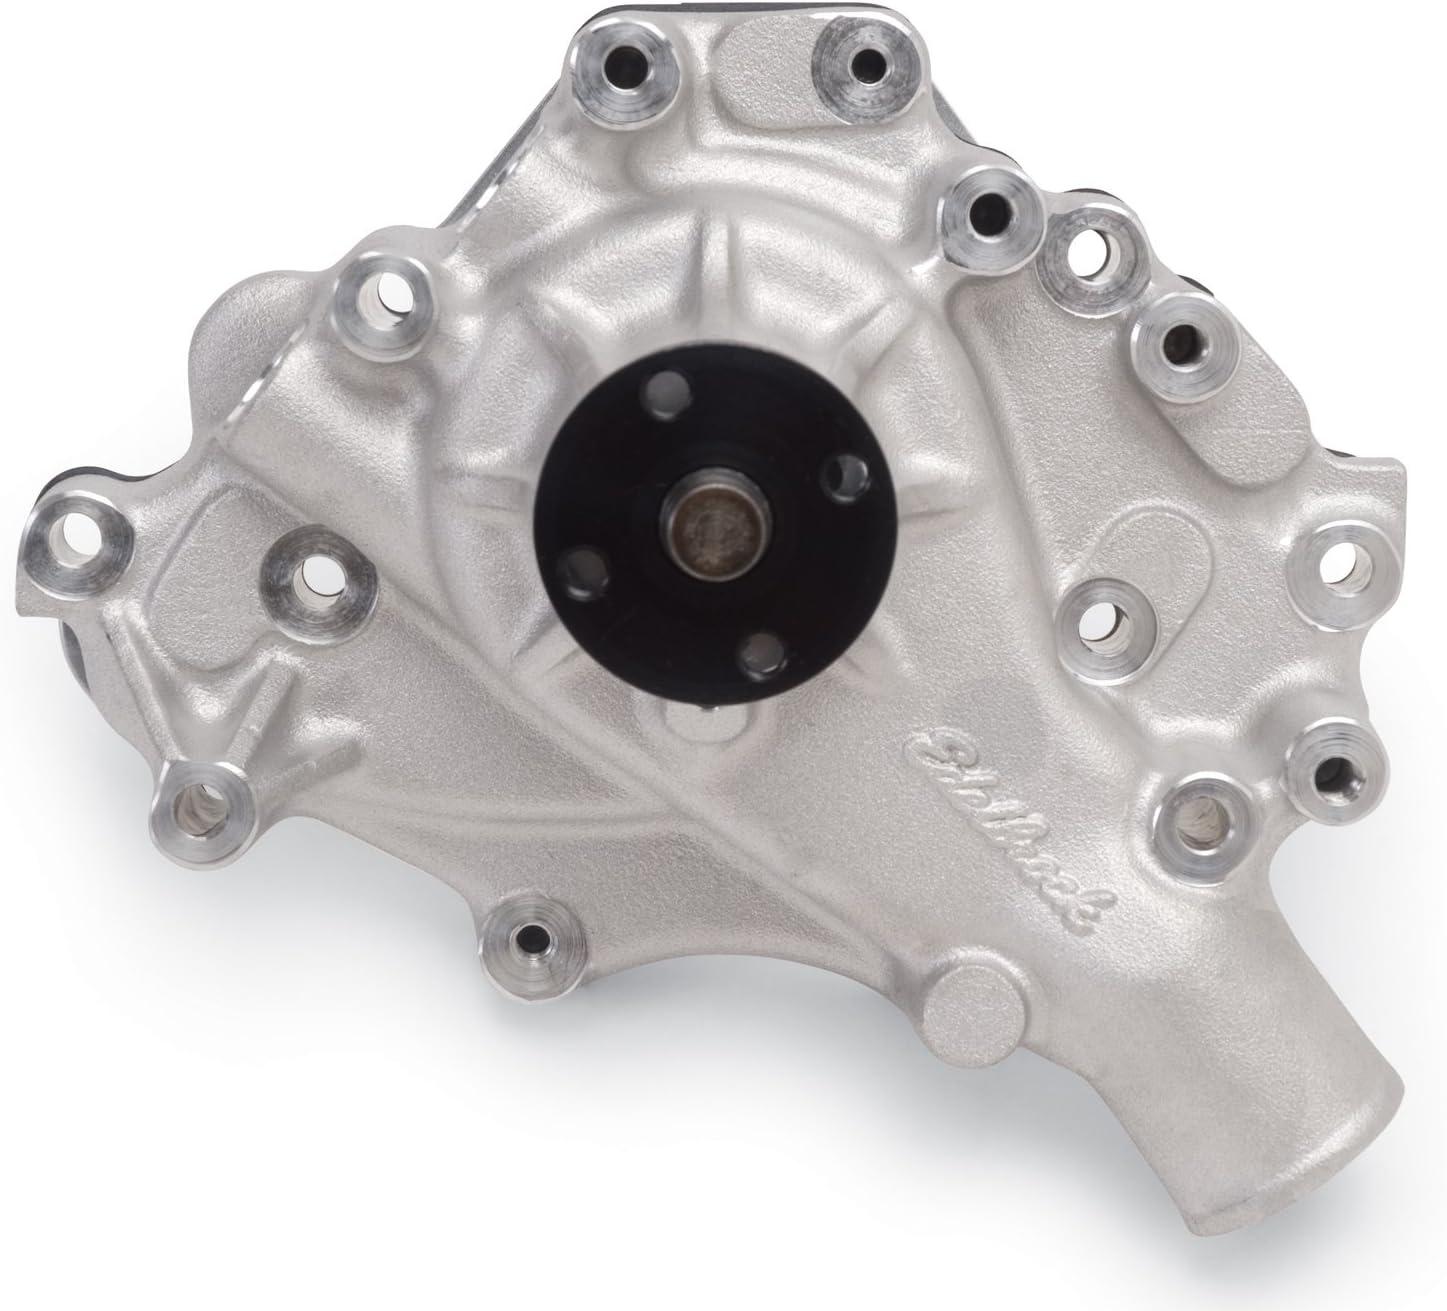 Edelbrock 8843 Popular Victor Series Water Mechanical Max 58% OFF Pump